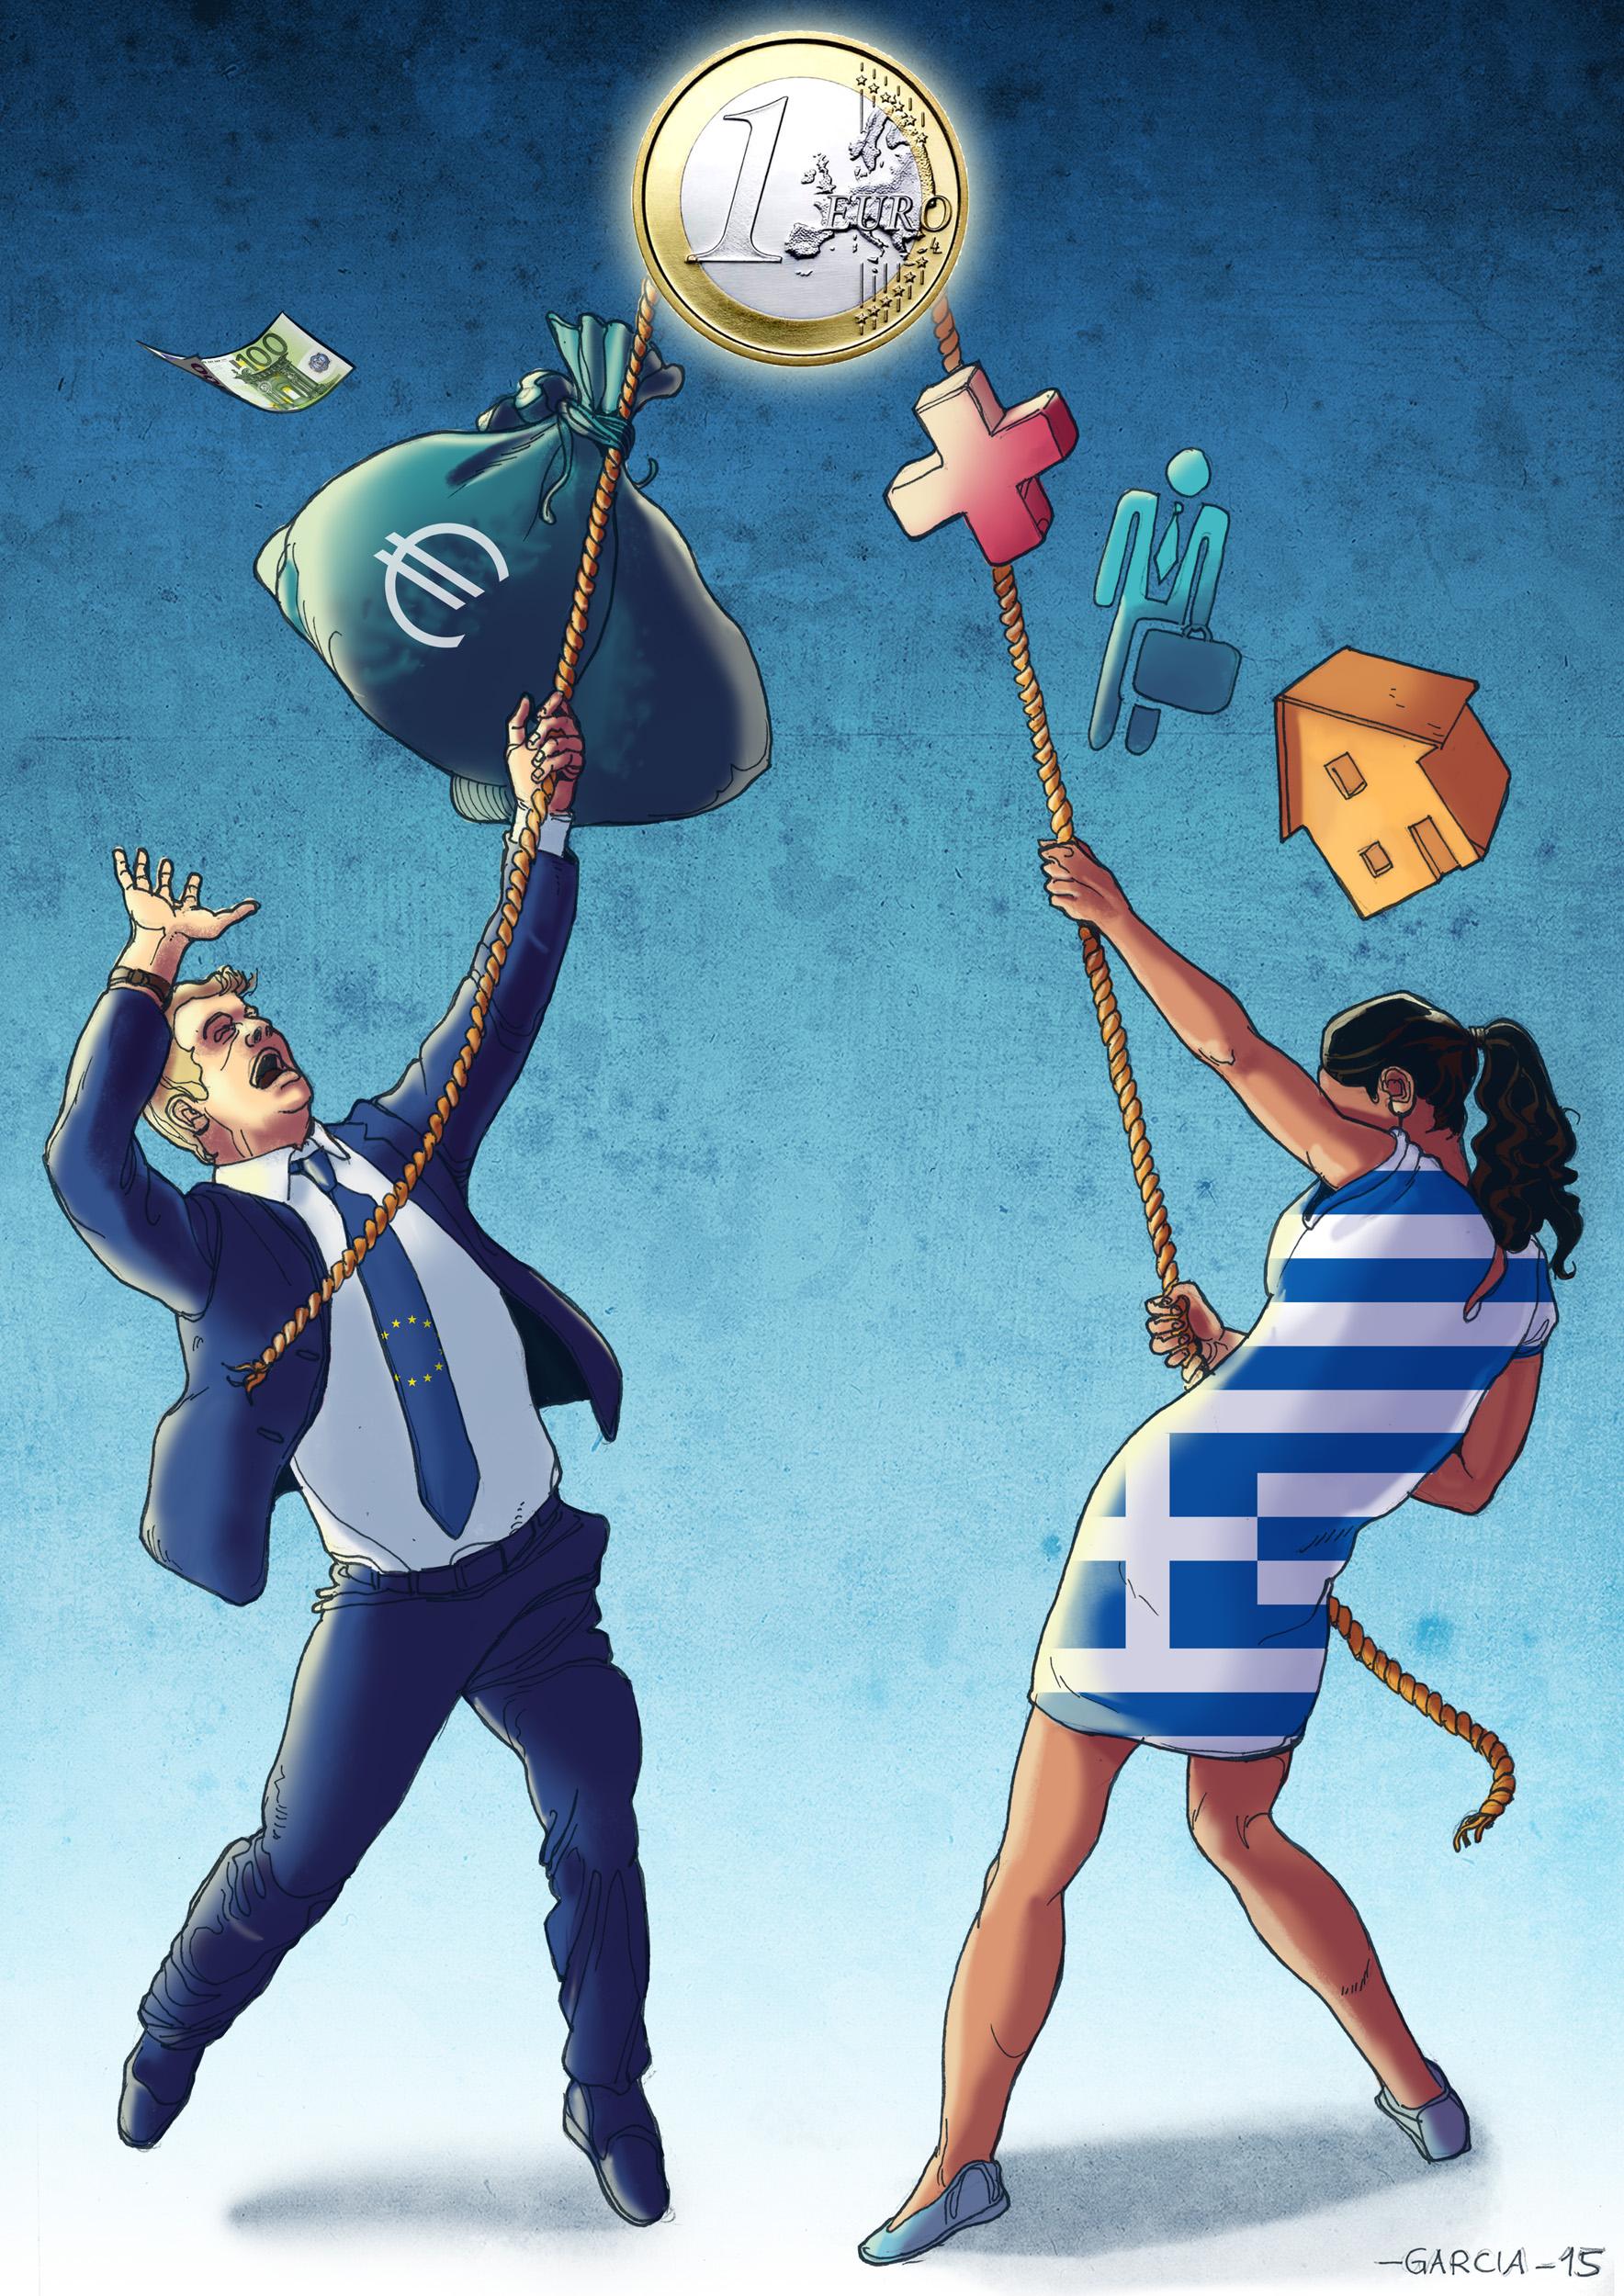 Daniel Garcia Art Illustration Greece Referendum Grexit Oxi Europe Crisis 2